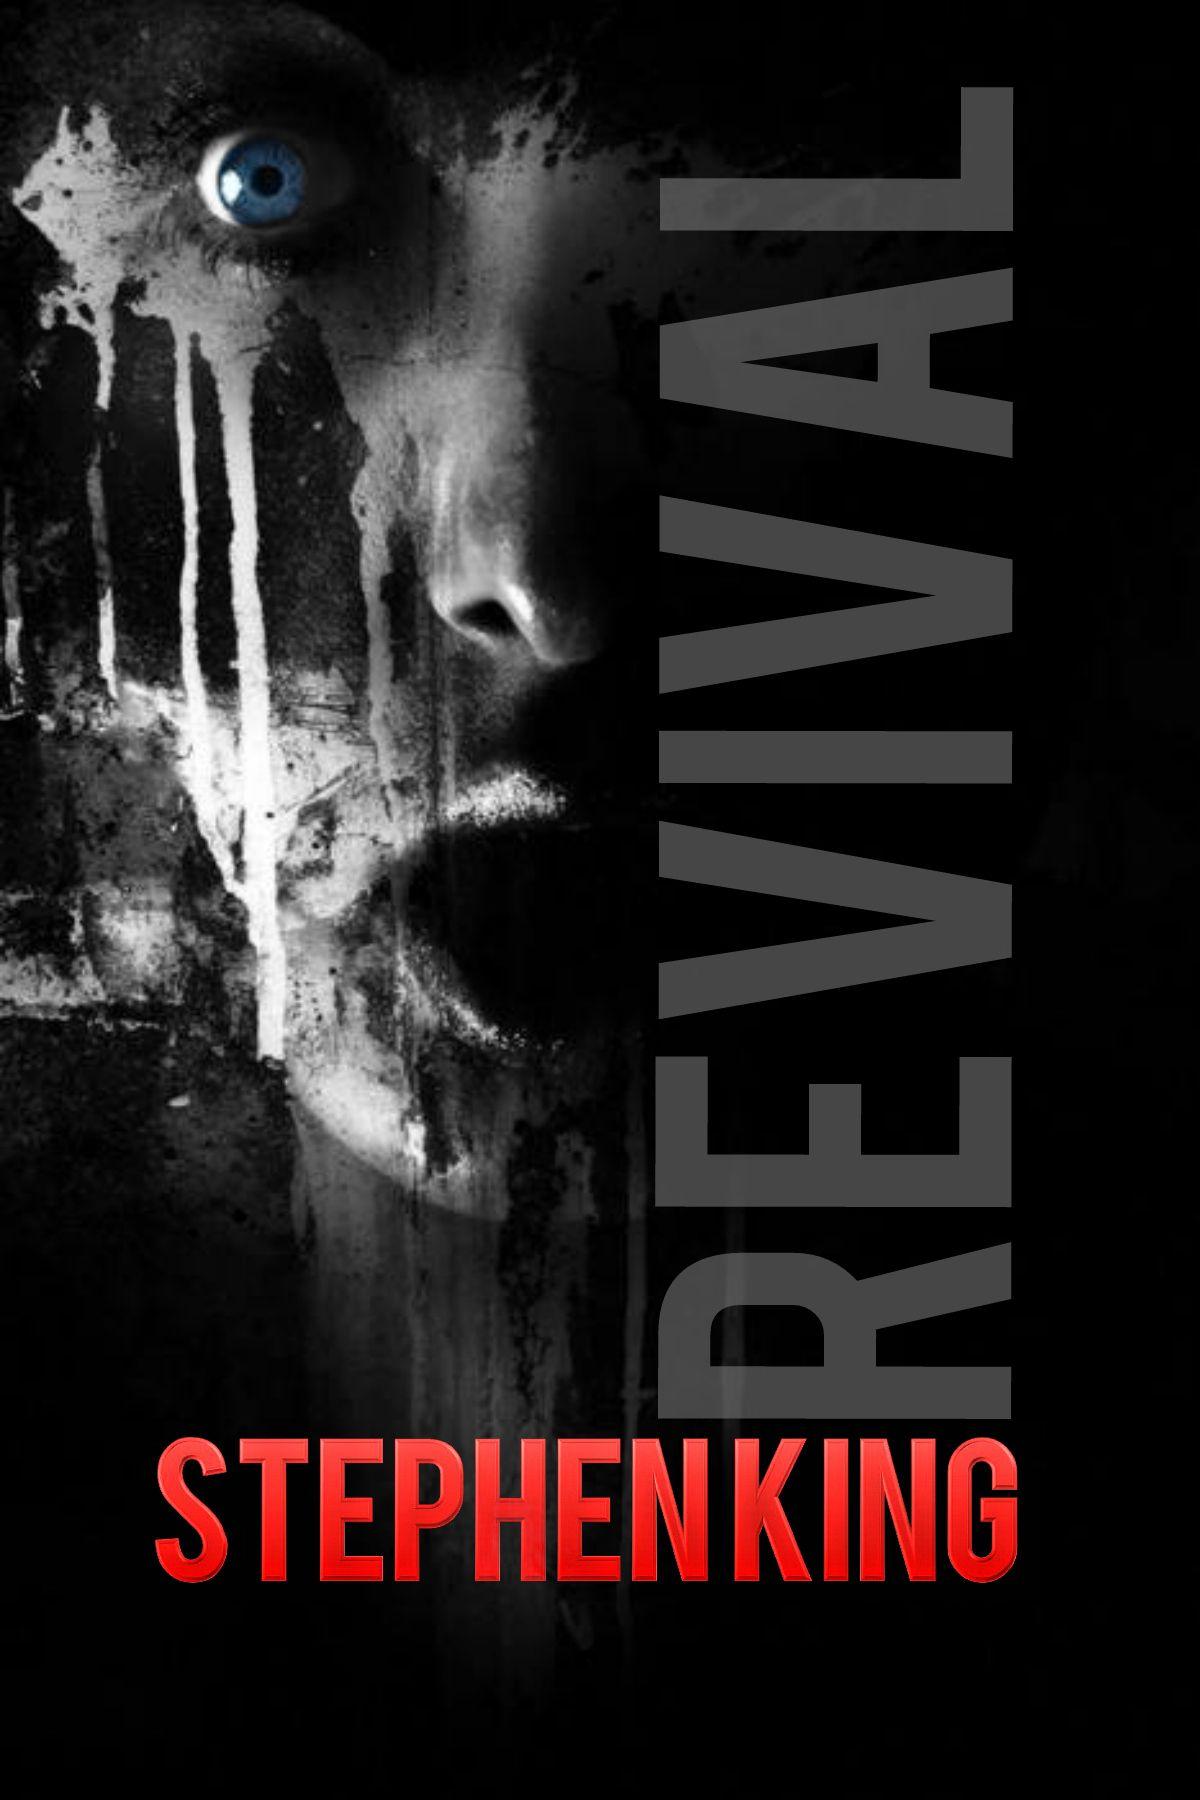 Revival stephen king goodreads giveaways